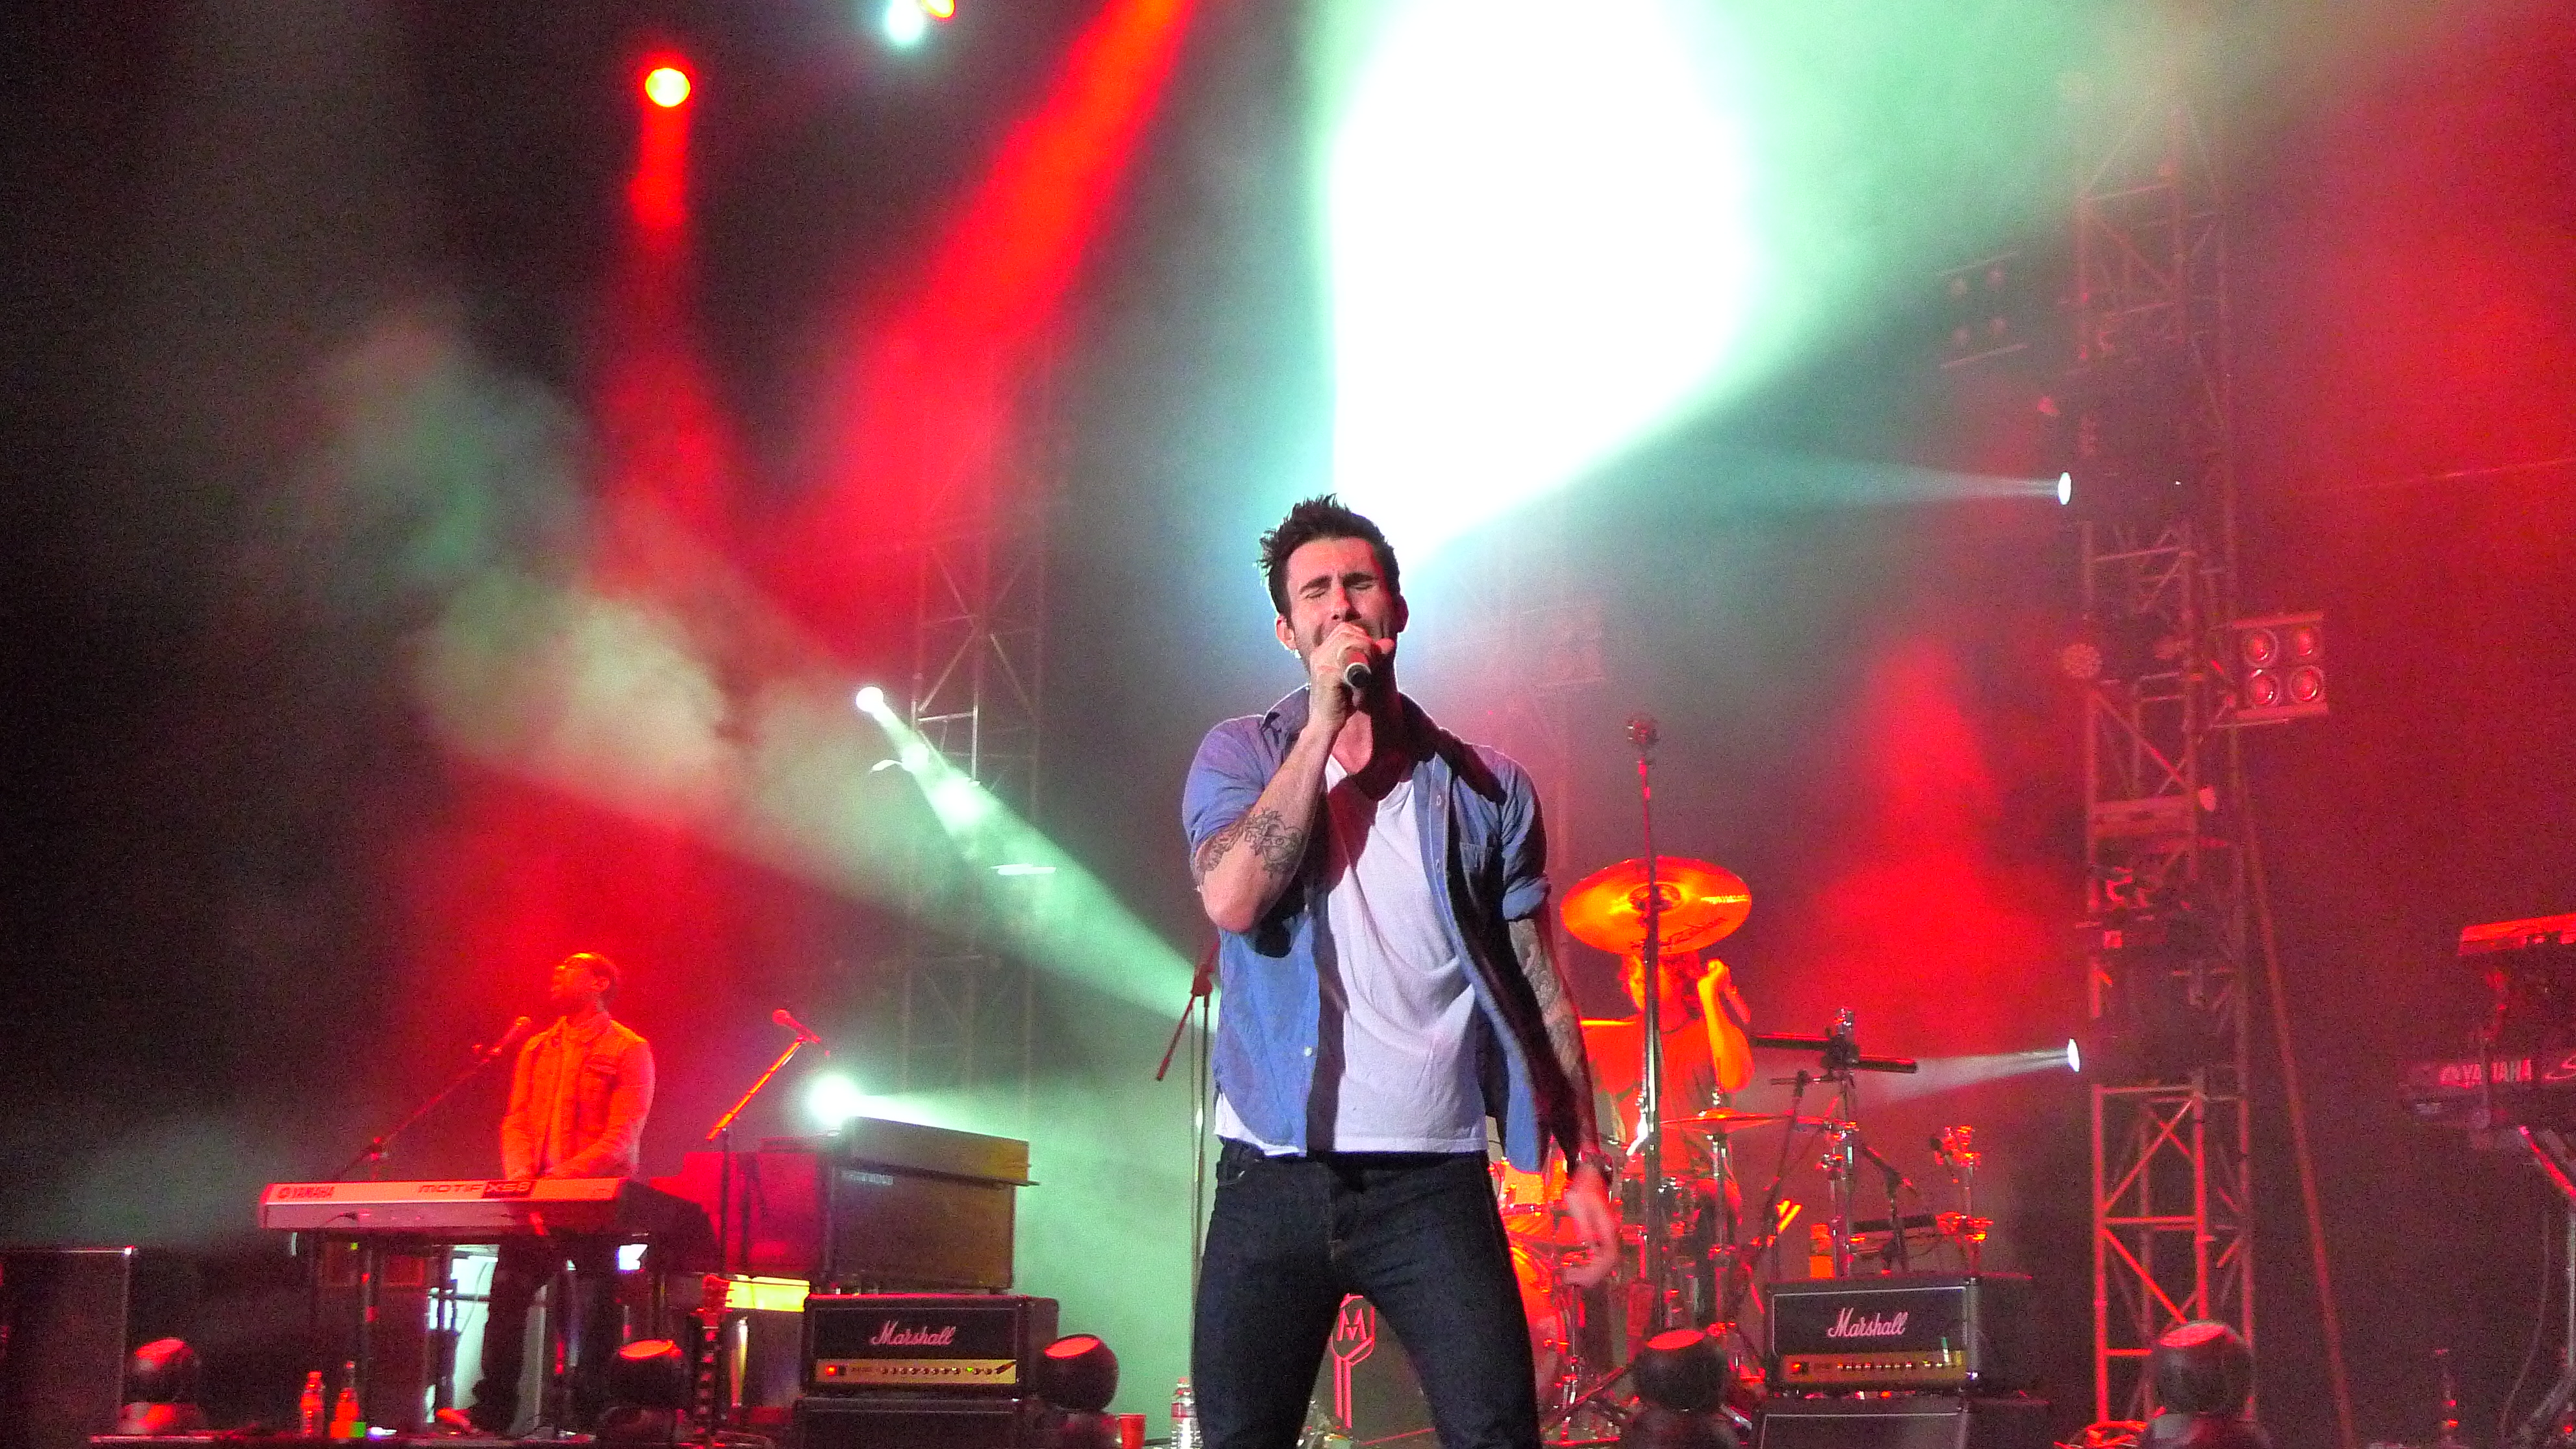 Interviewly - Maroon 5 September 2014 - reddit AMA